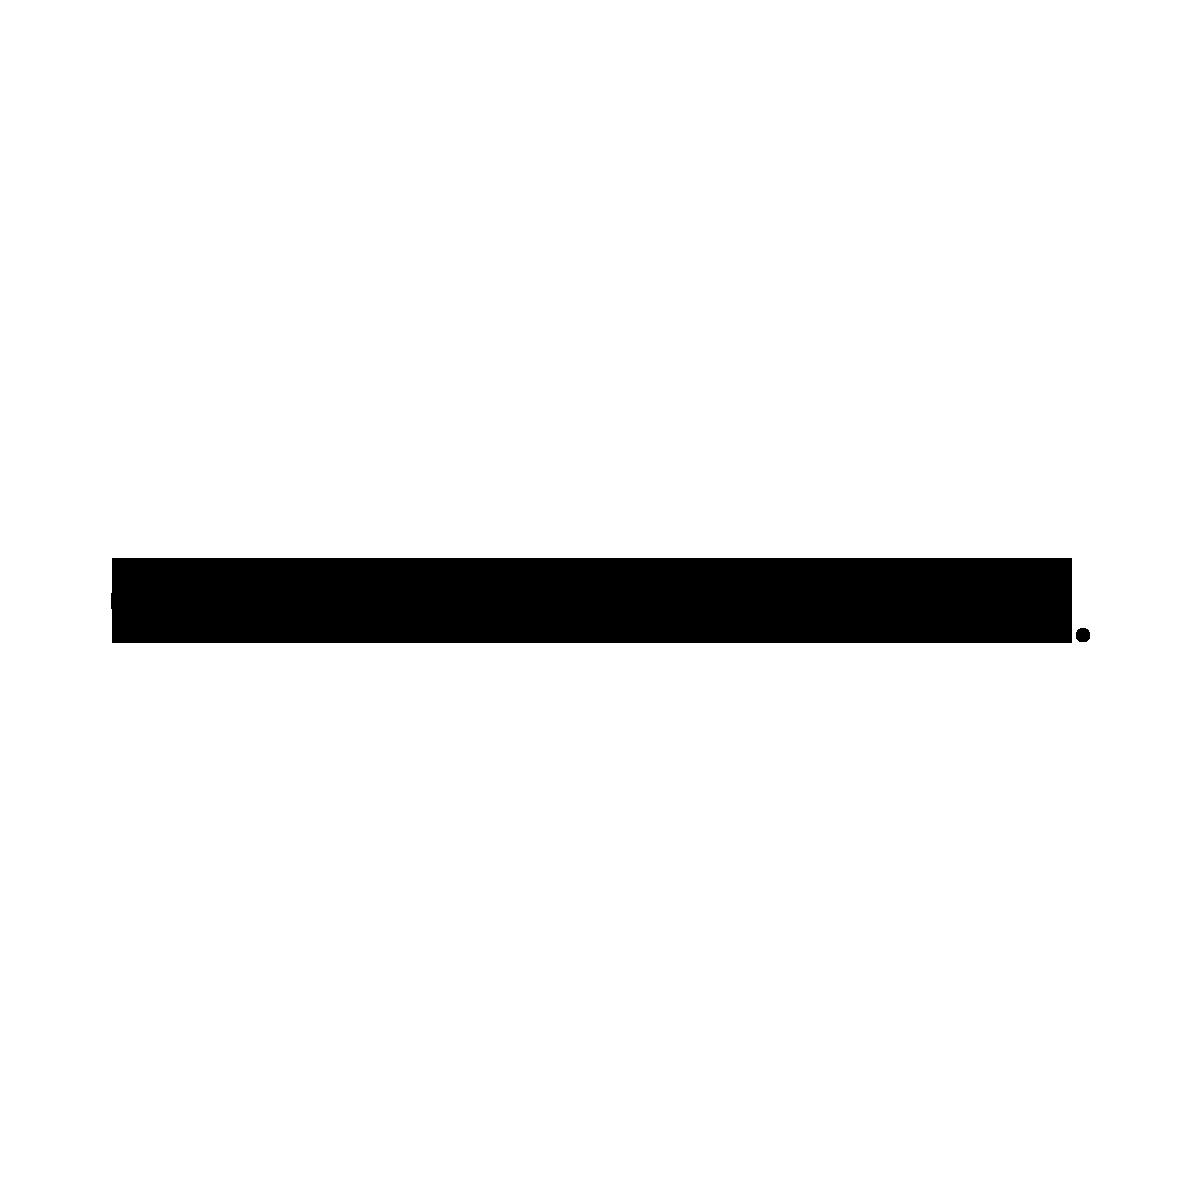 Schultertasche-per-Hand-geschliffenes-Leder-Cognac